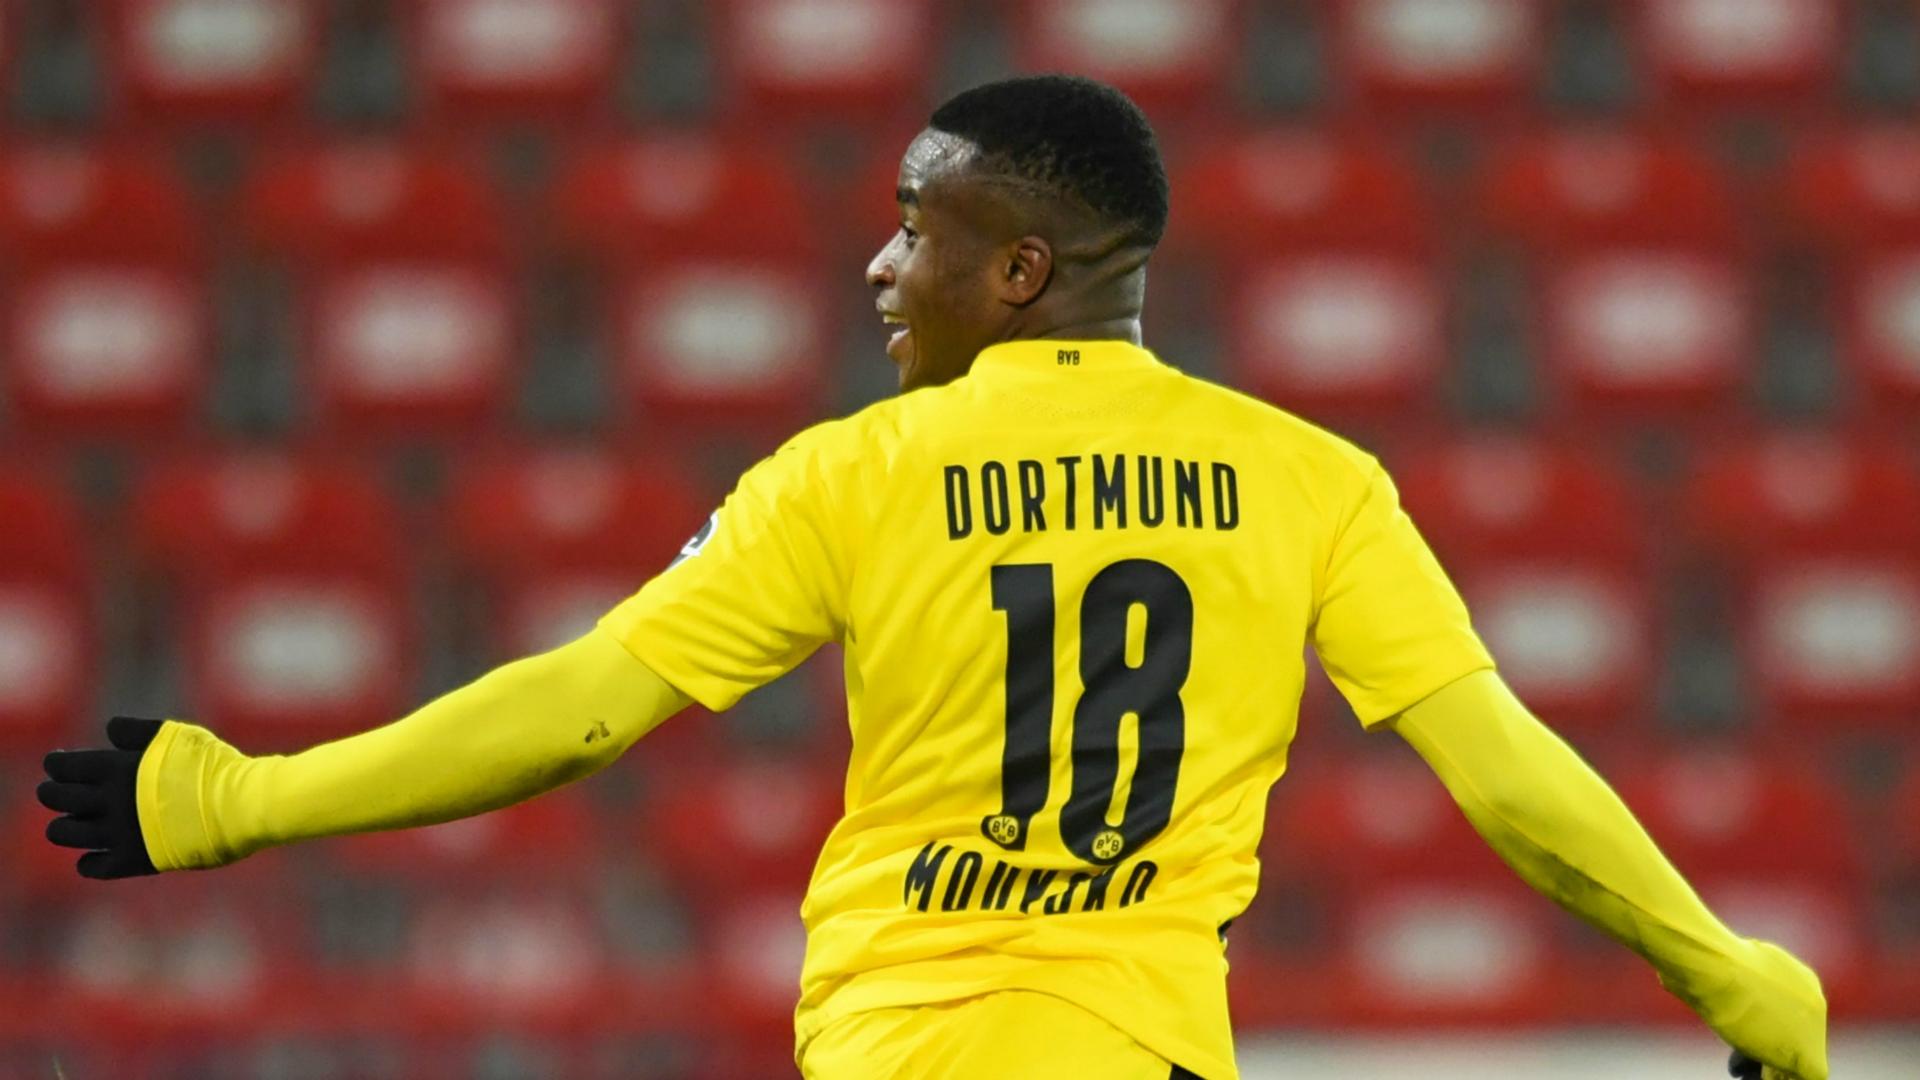 Dortmund's star in the making Moukoko becomes youngest ever Bundesliga goalscorer